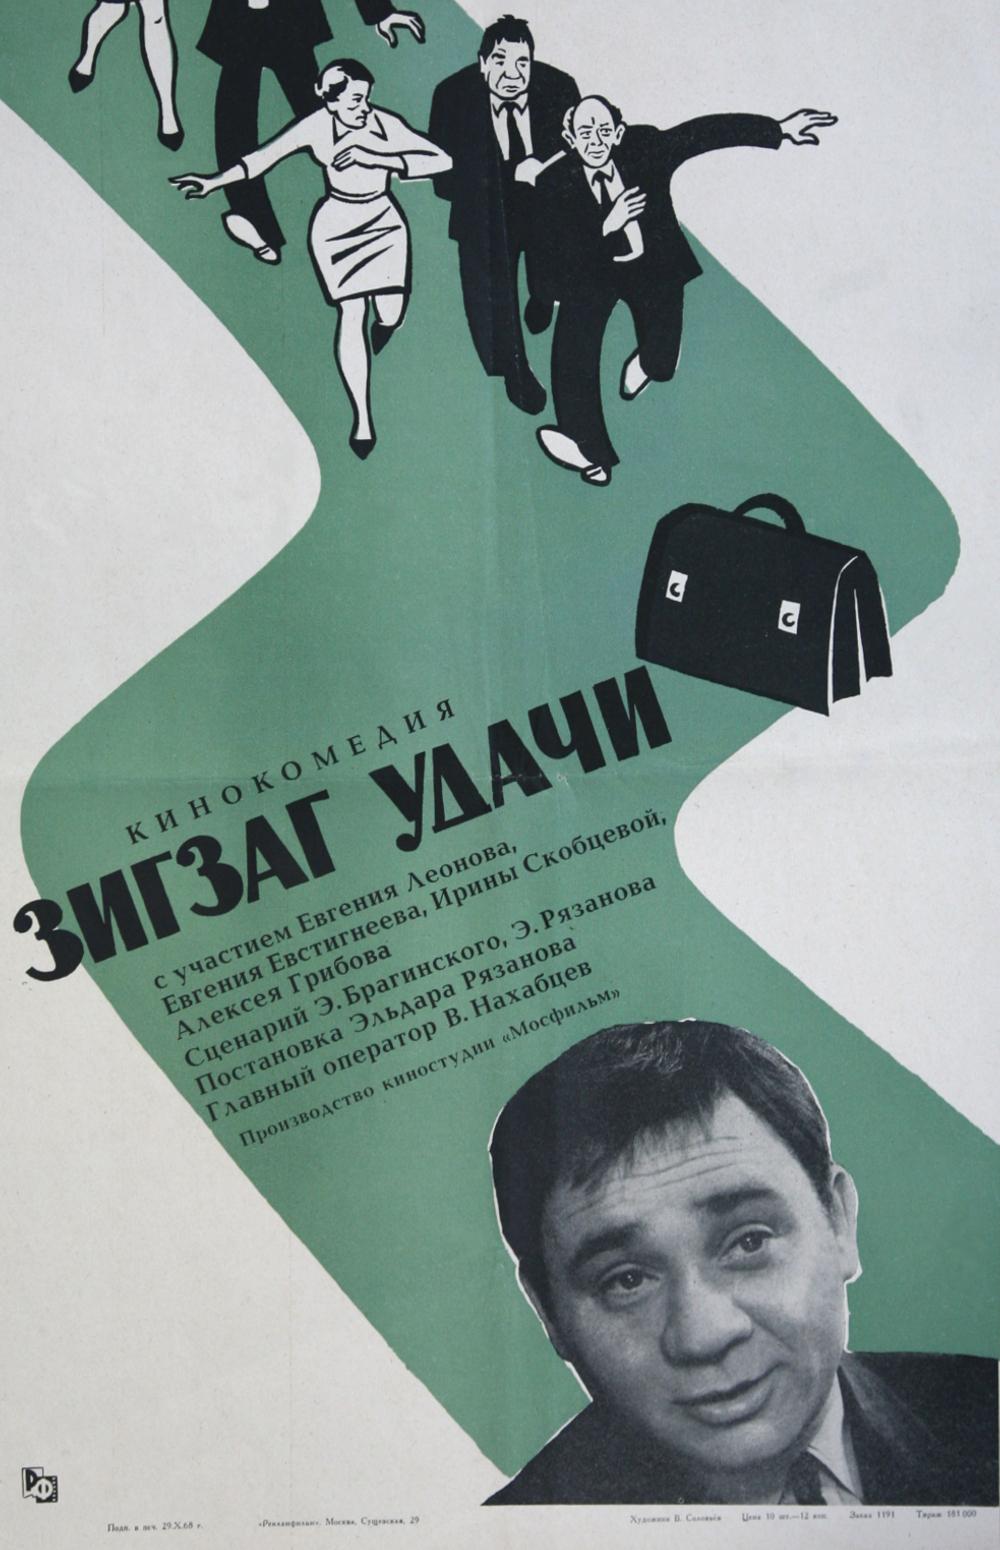 Nikita Mikhalkov survived Marina Golubkina from her apartment 10/28/2010 78